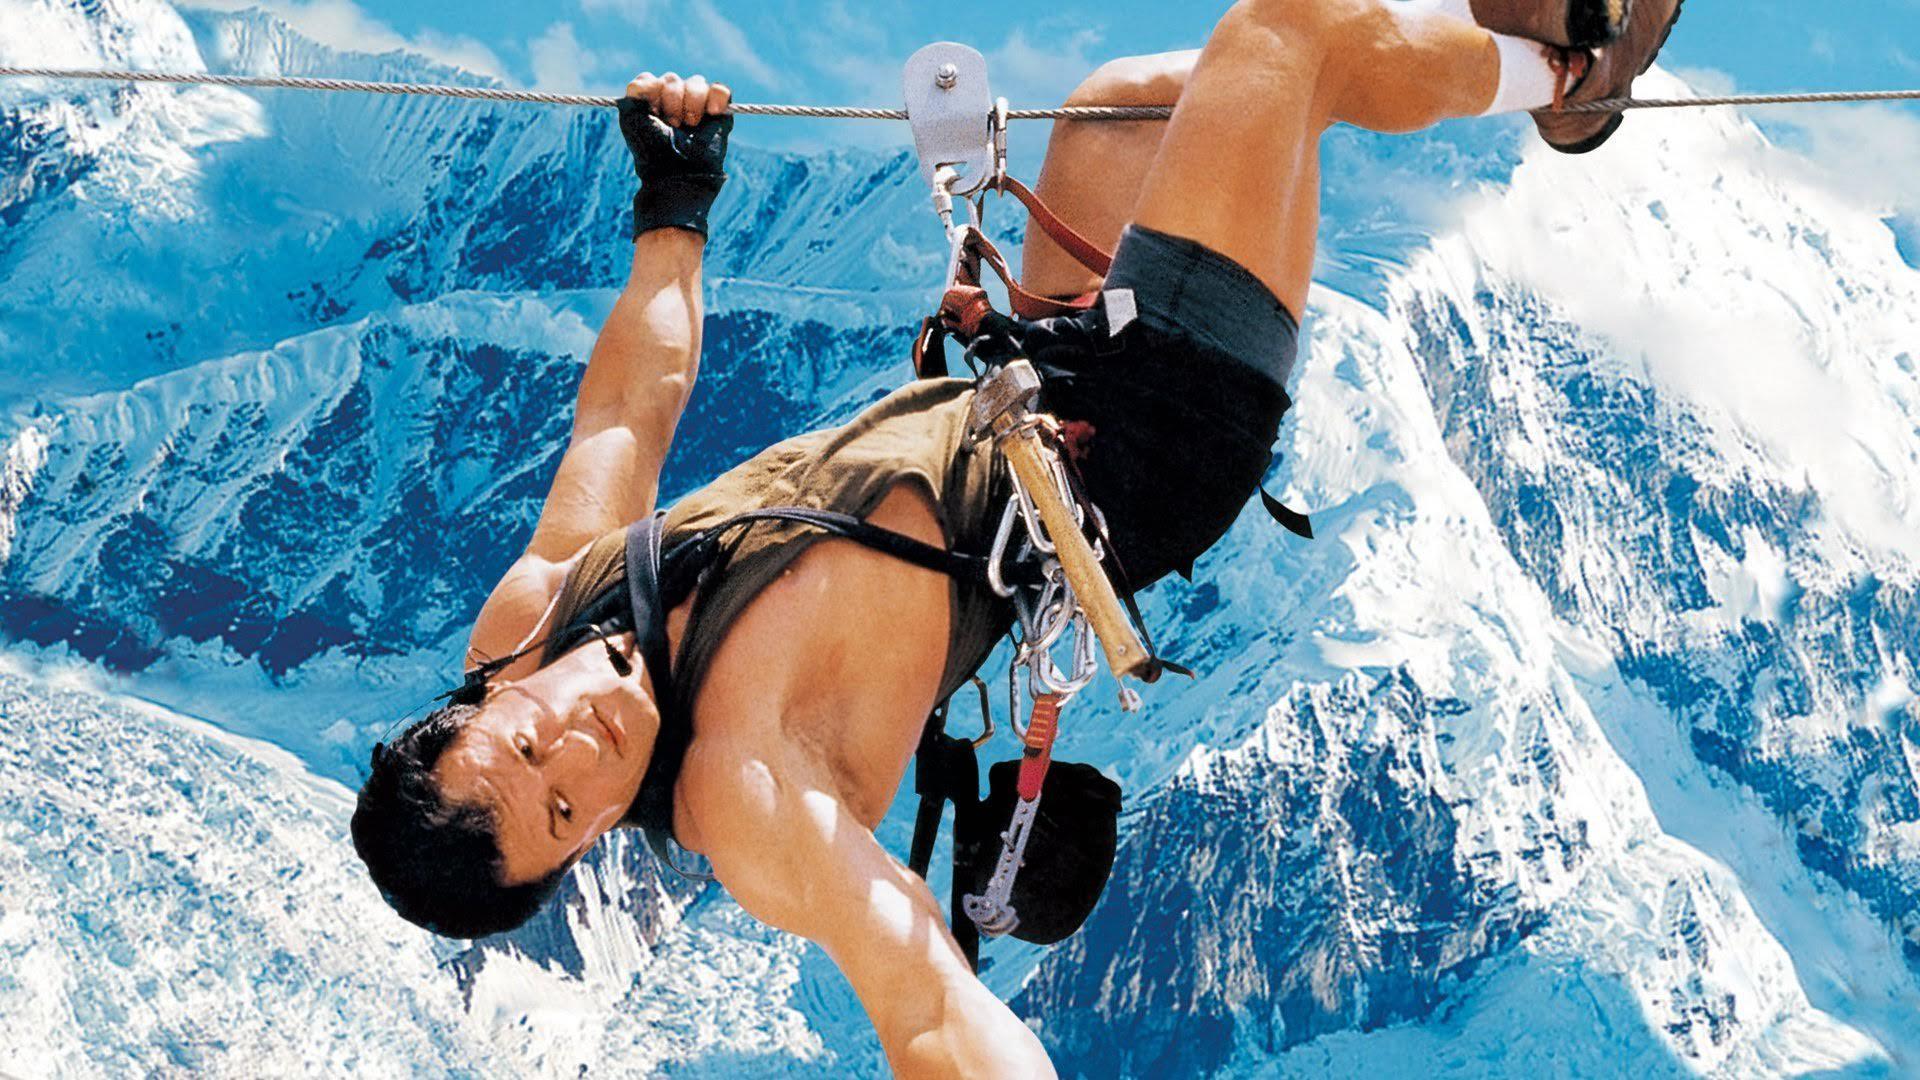 Cliffhanger :「ワイルド・スピード」シリーズから追放された大物プロデューサーのニール・モリッツが、スタローン隊長の山岳アクション映画「クリフハンガー」の女版リメイクを製作 ! !